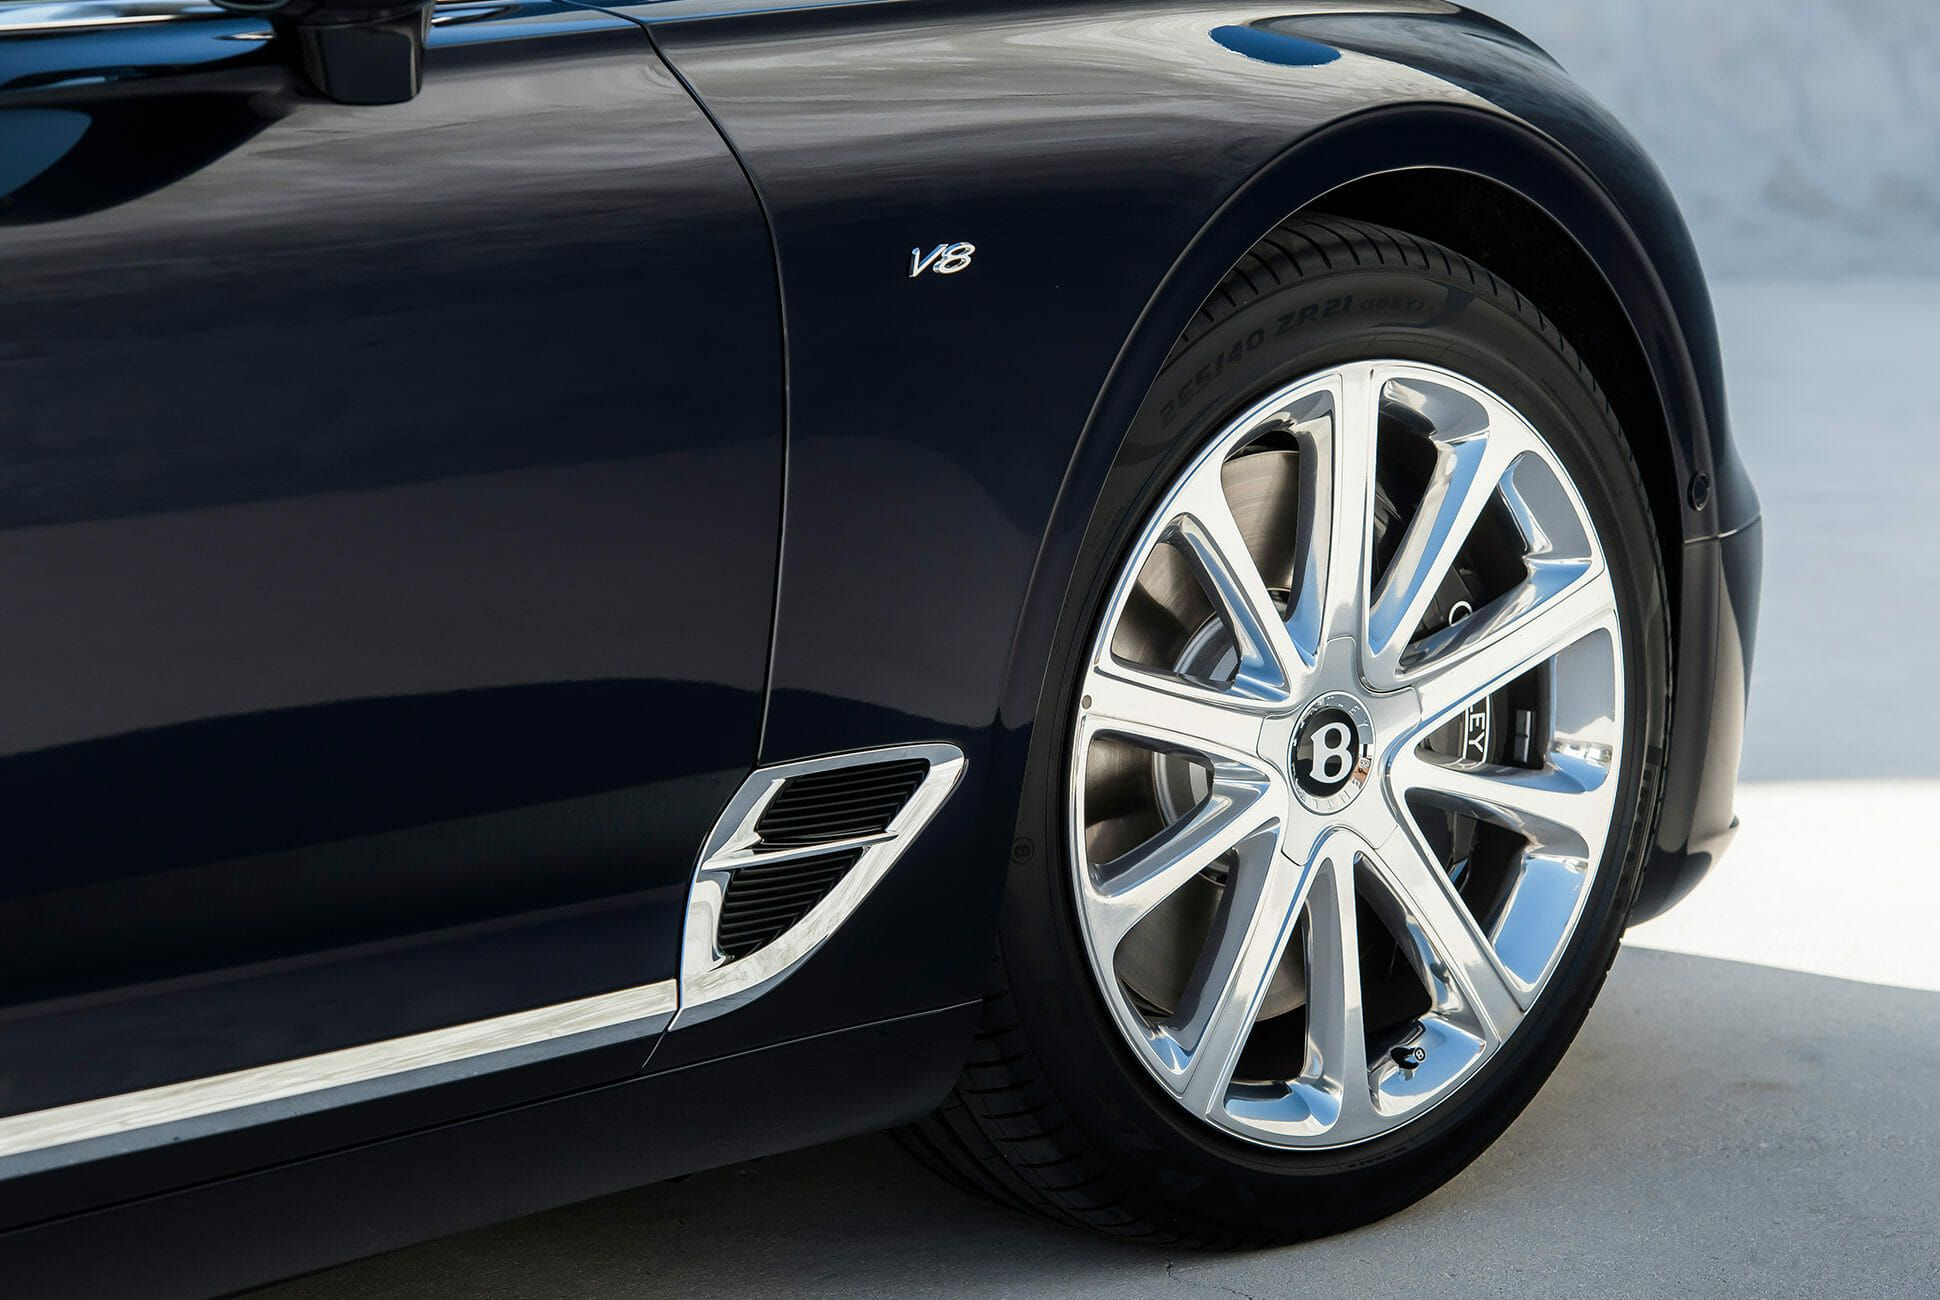 Bentley-Continental-GT-Convertible-V8-gear-patrol-slide-08